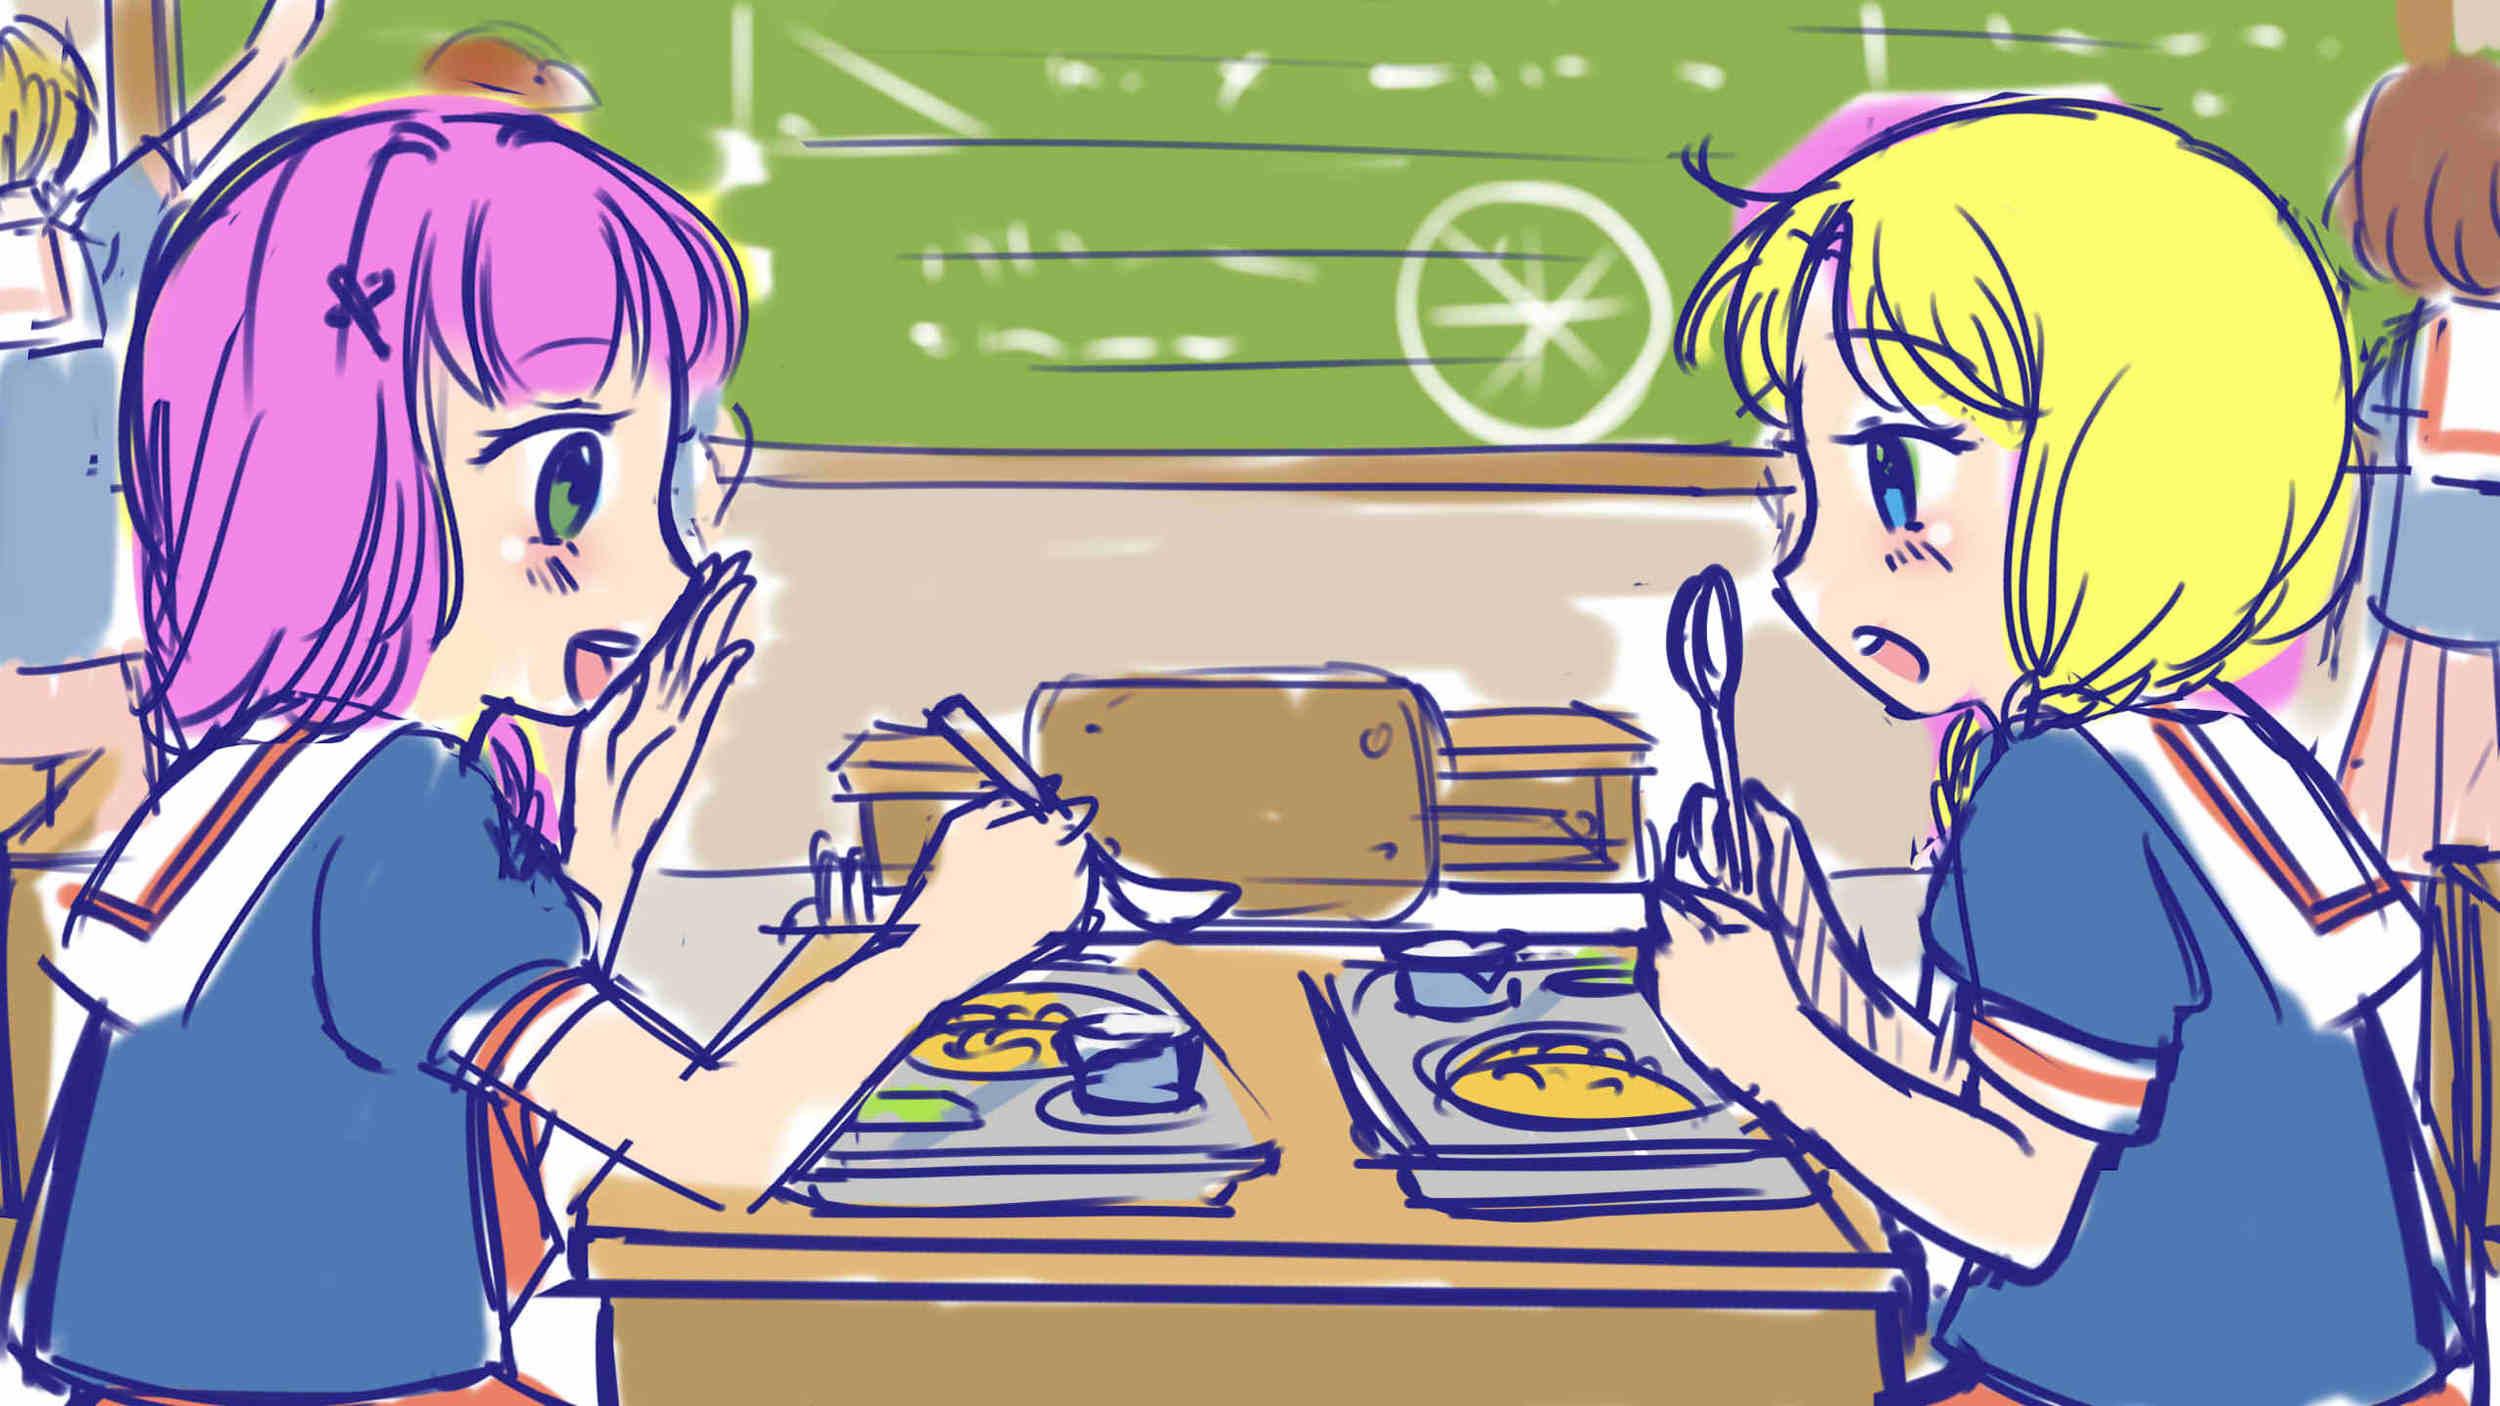 CG7(1)_Sketch color v2.jpg